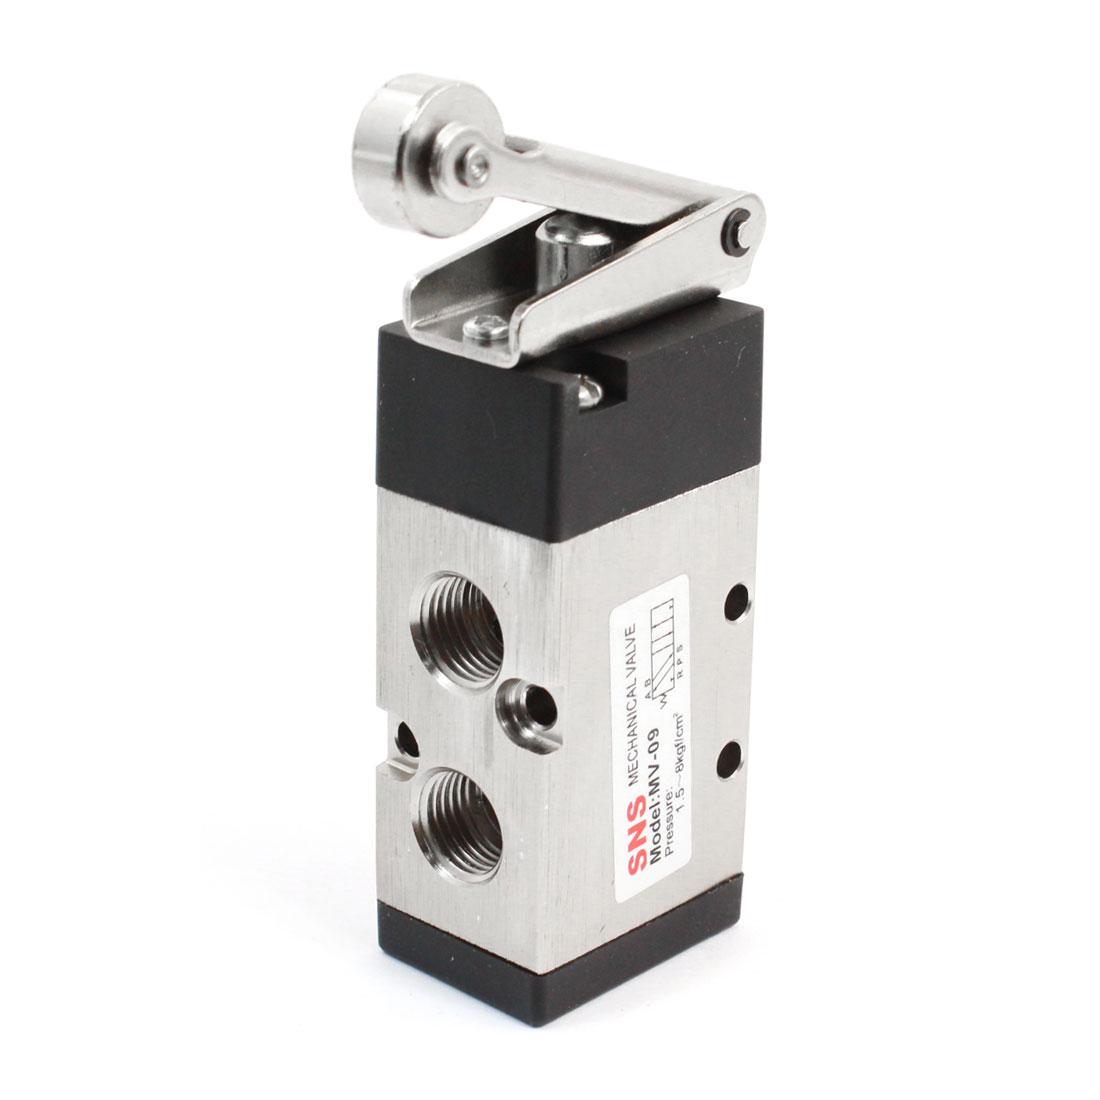 Single Roll 1/4PT Female Thread 2 Position 5 Way Roller Lever Mechanical Valve